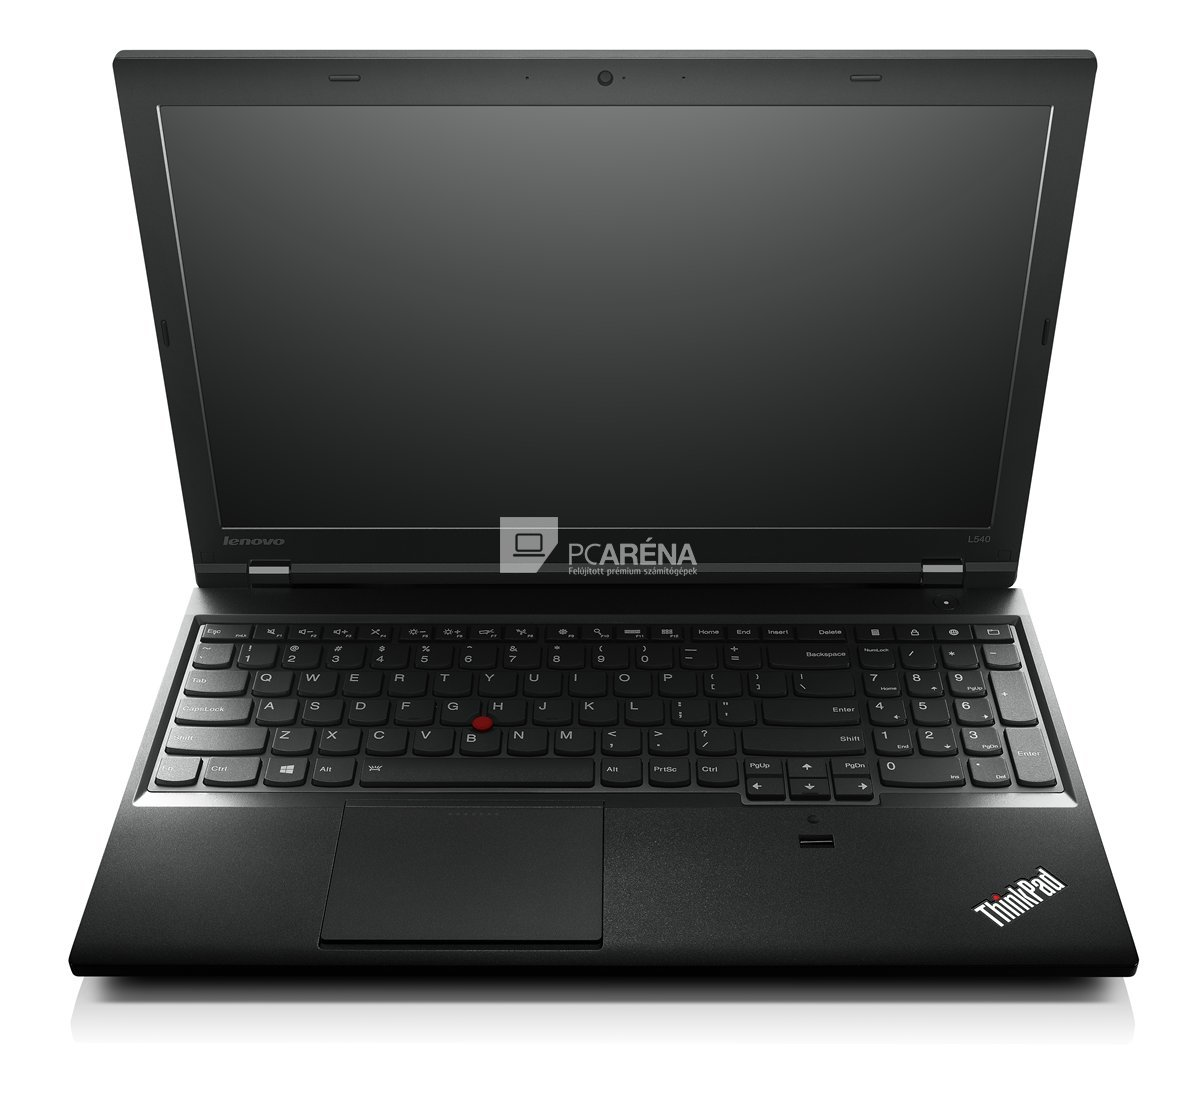 Lenovo ThinkPad L540 laptop